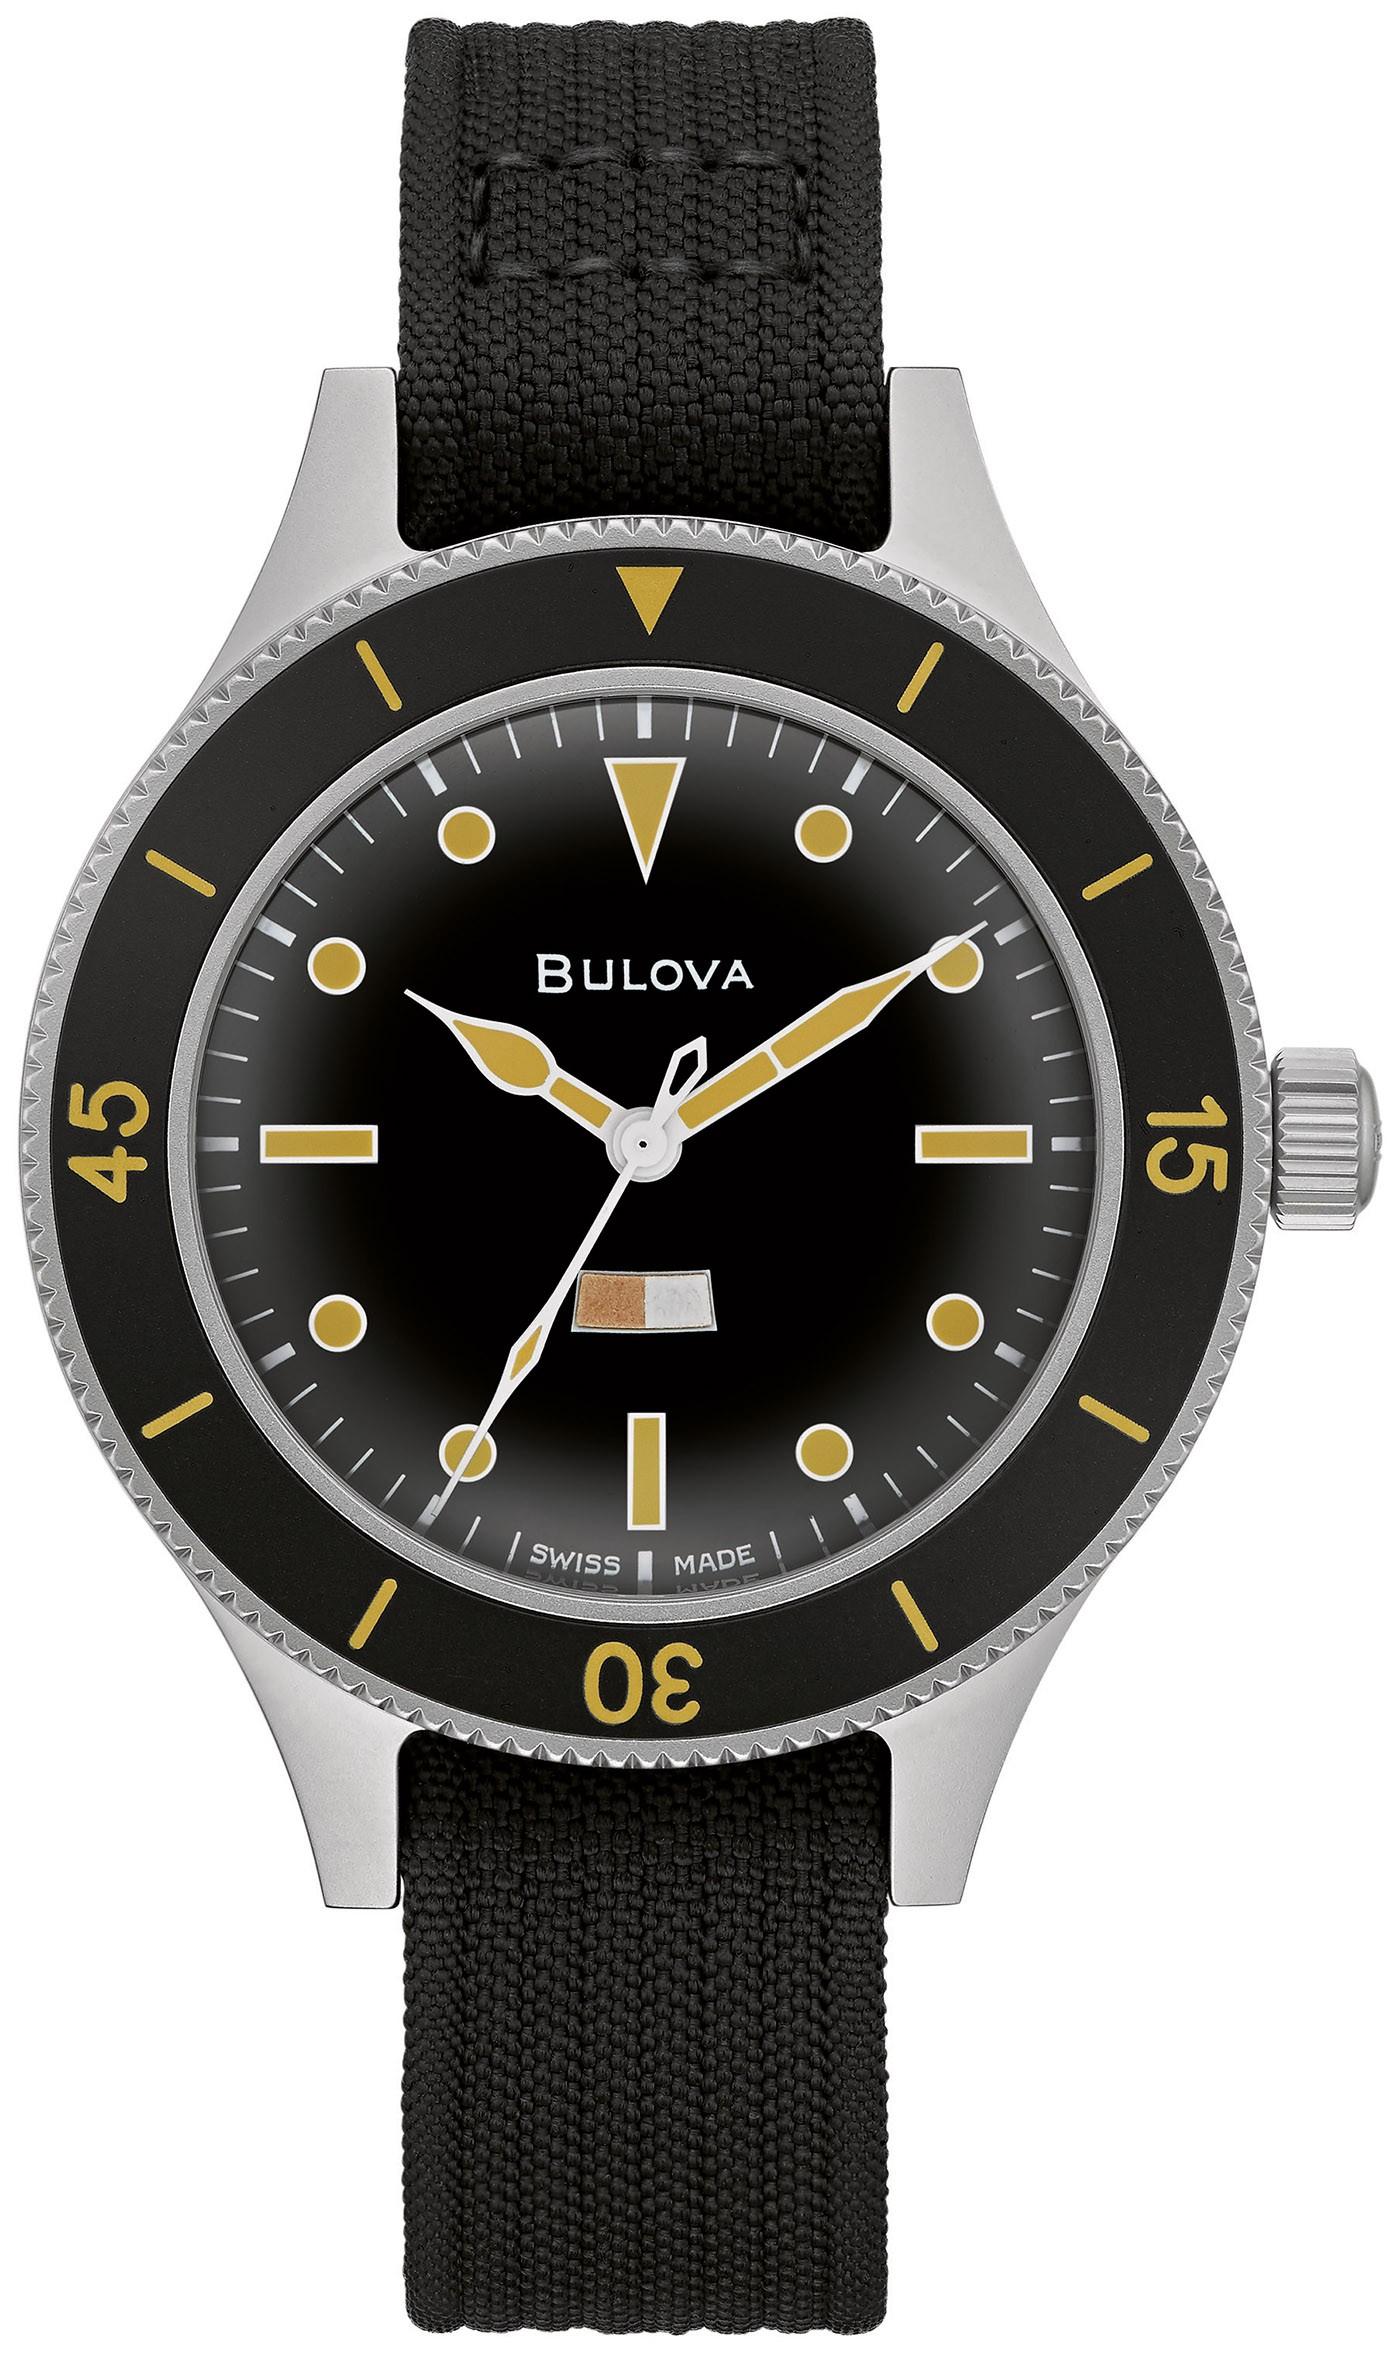 Bulova Mil Ships 2 1